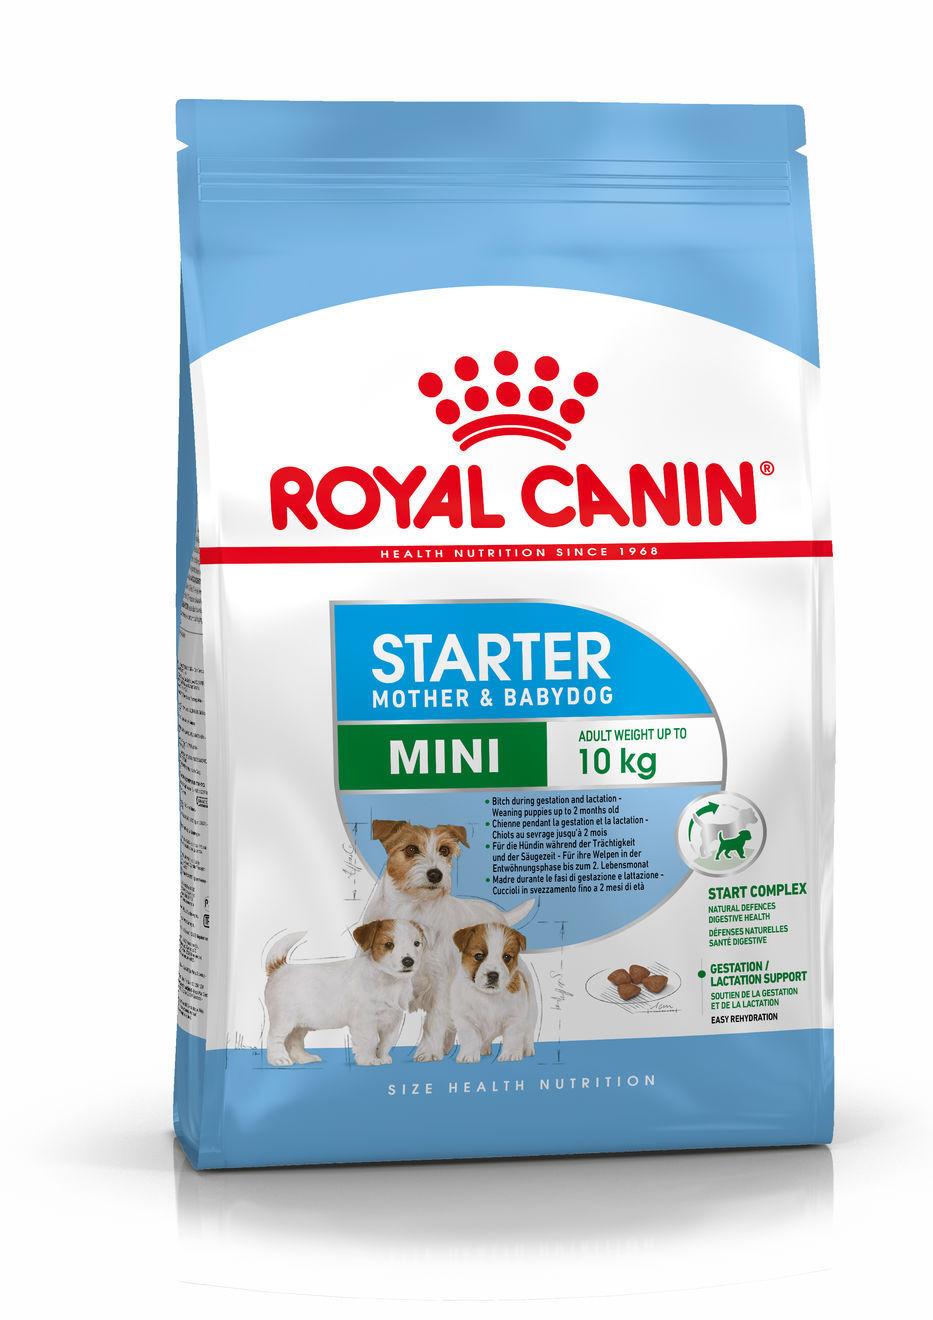 economico online Pienso para cachorros de raza pequeña Royal Canin MINI MINI MINI STARTER MOTHER&BABYDOG  prezzi bassissimi